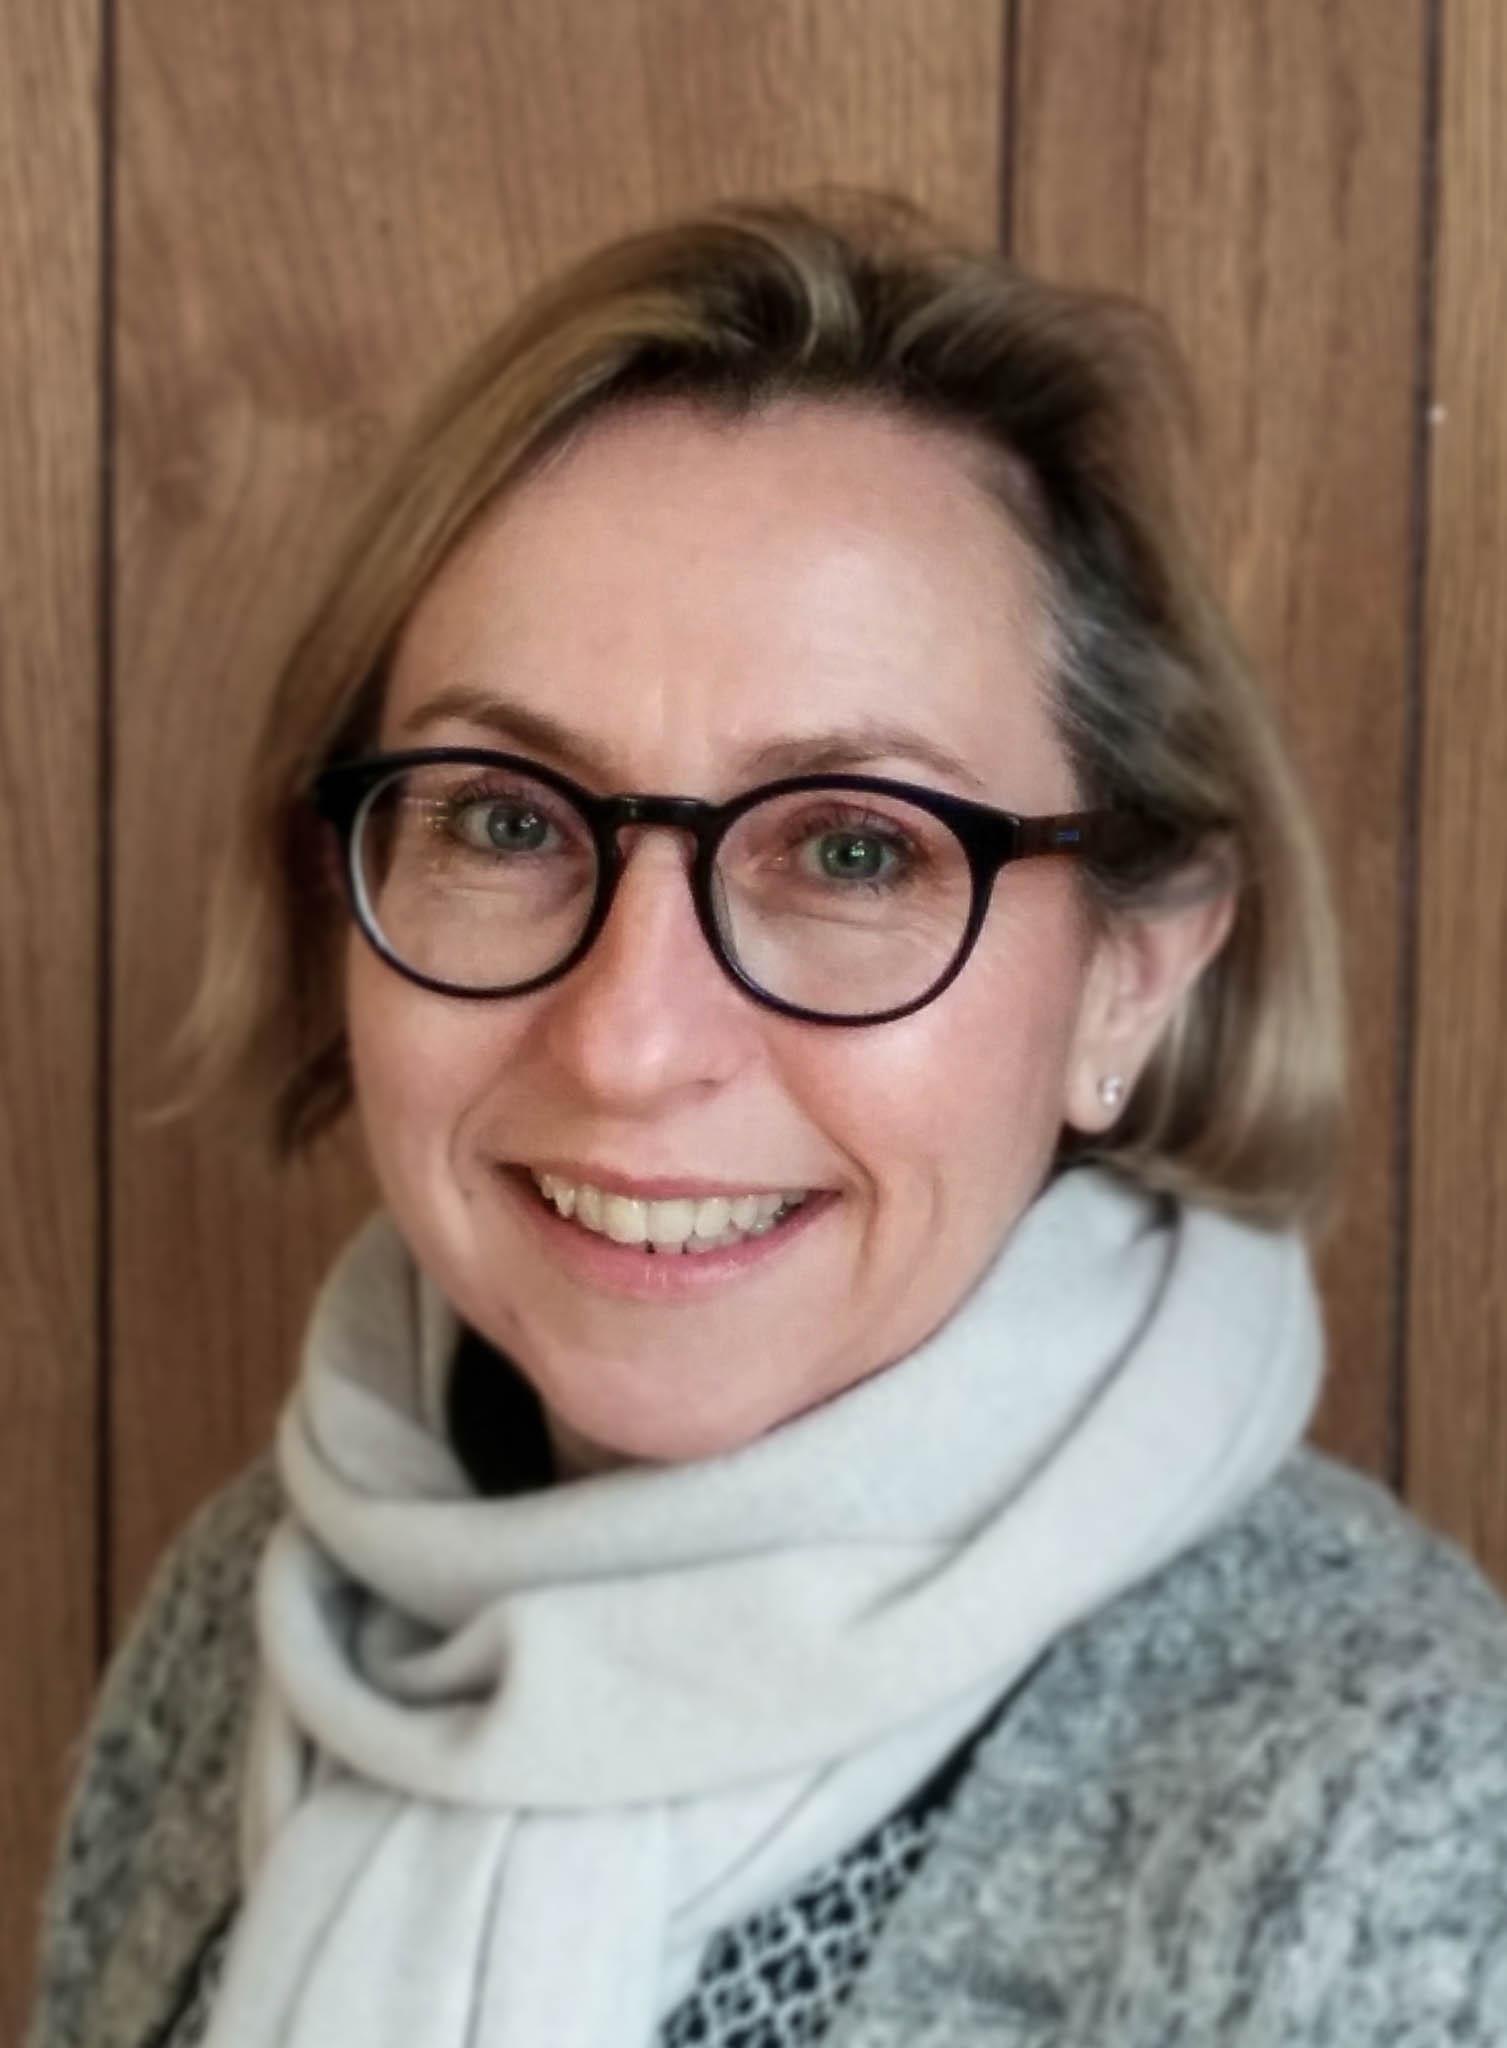 Claire Costard : Church Administrator